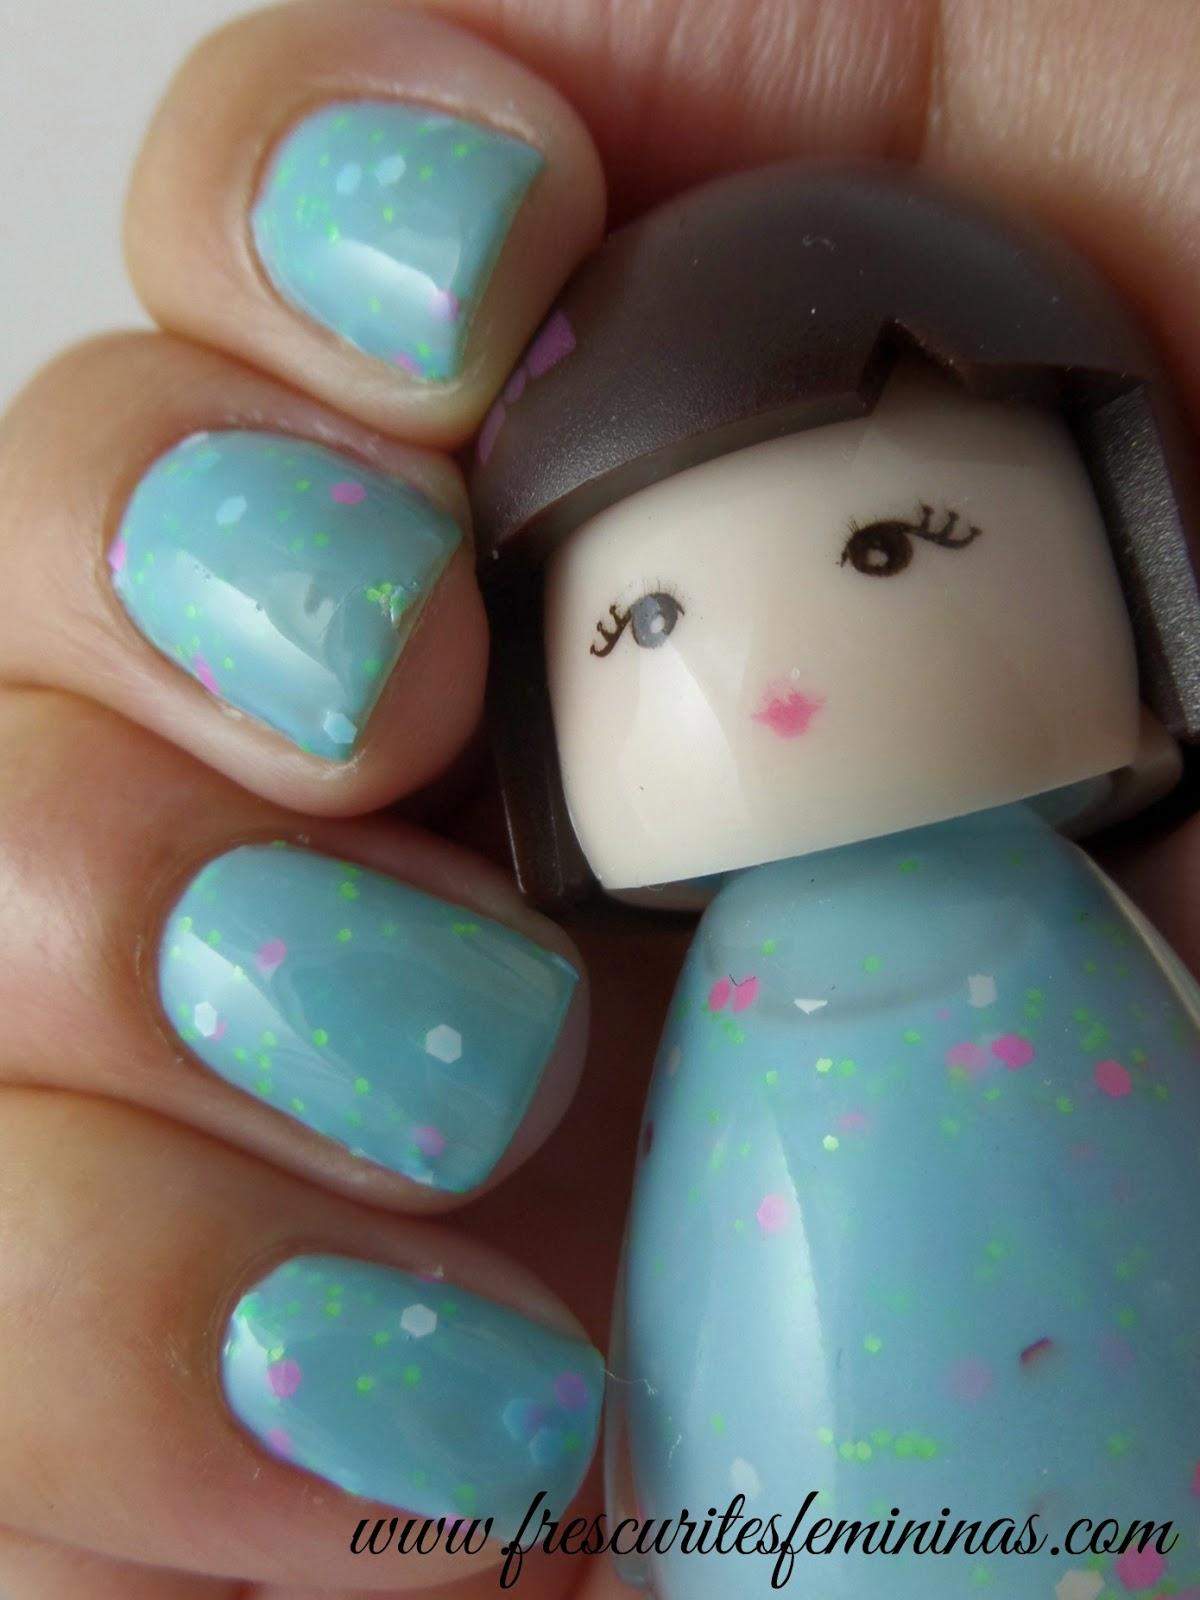 Frescurites Femininas, 42, blue nails